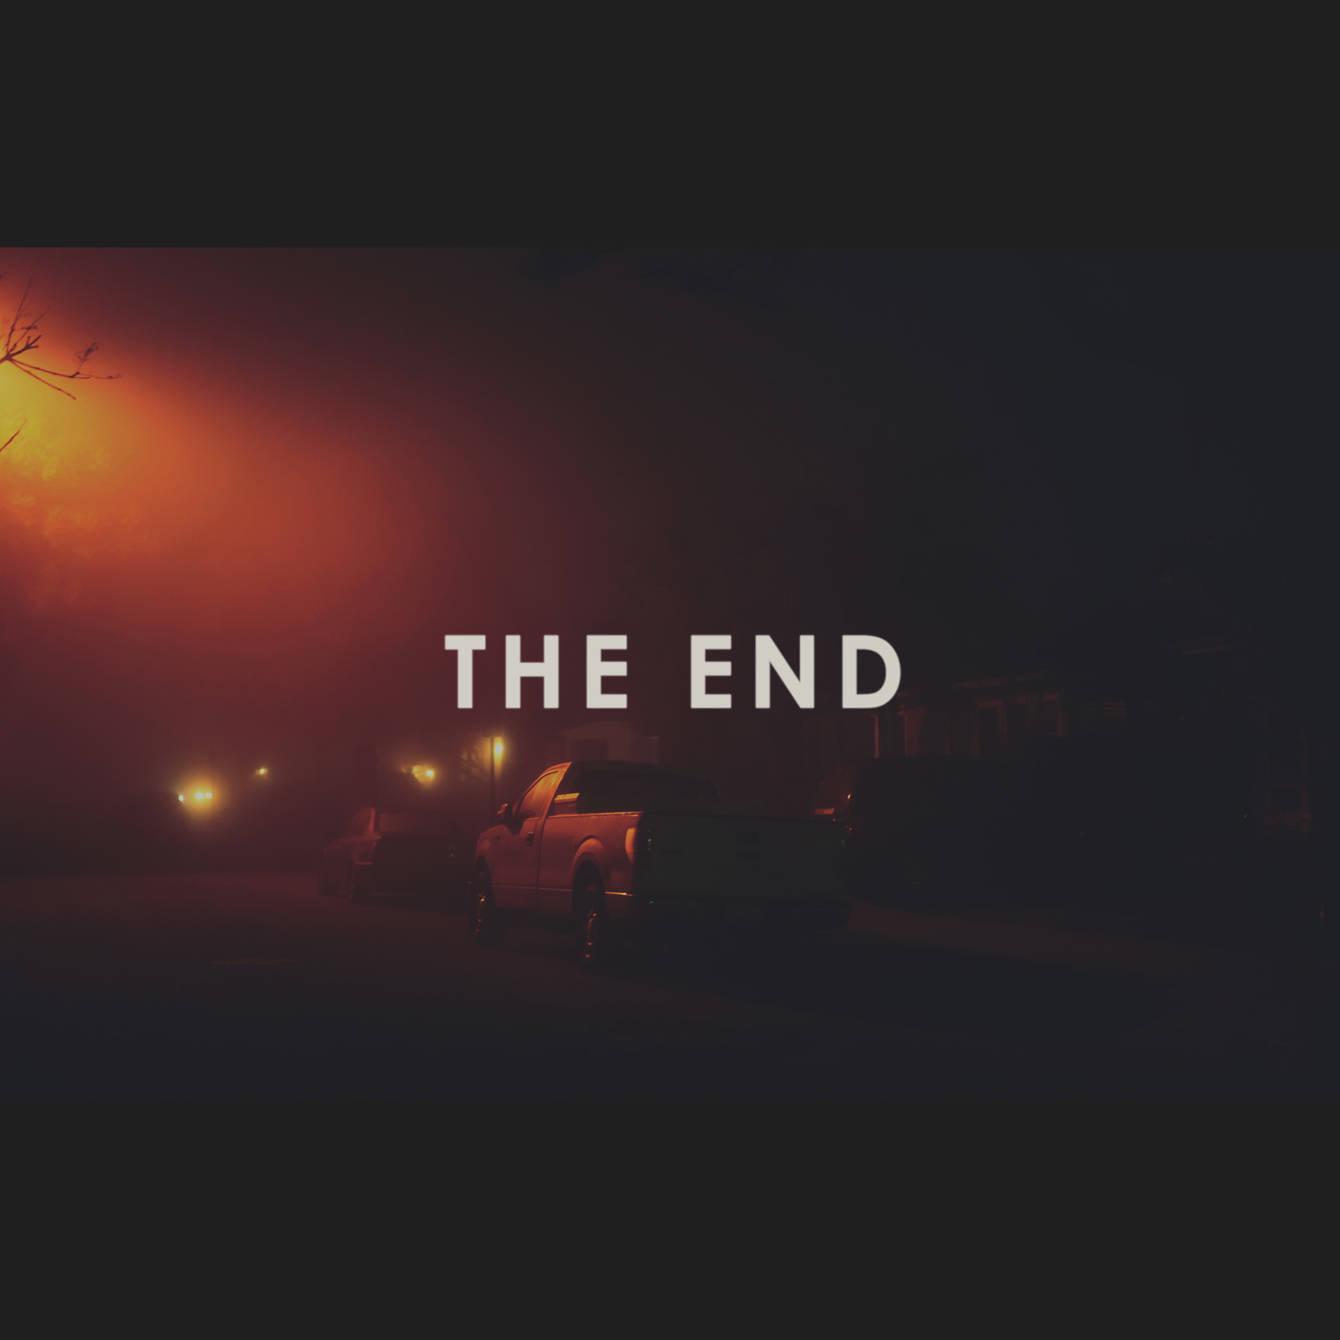 پایان سال